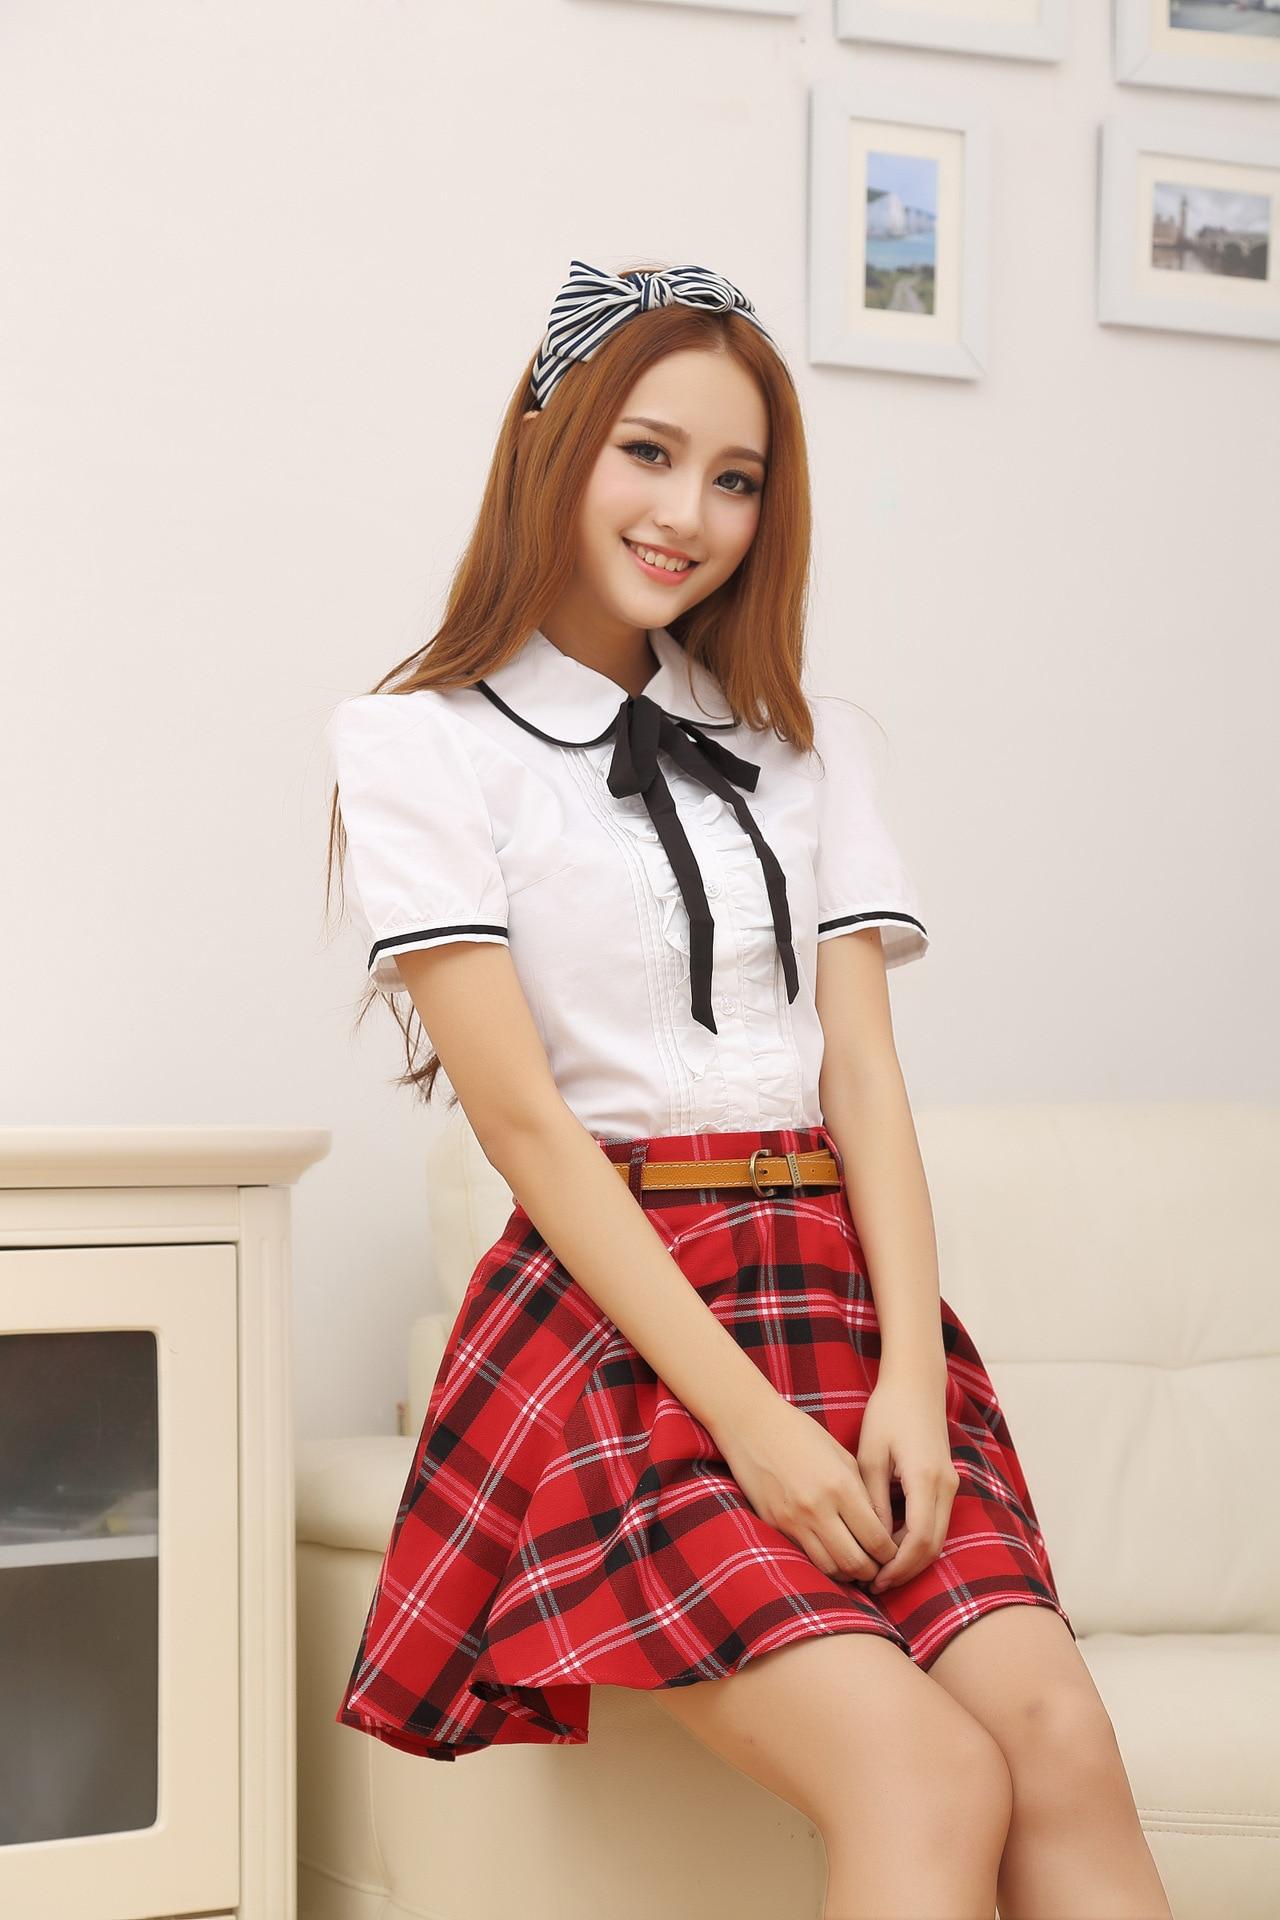 korea-schoolgirl-fuck-robin-sydney-naked-pics